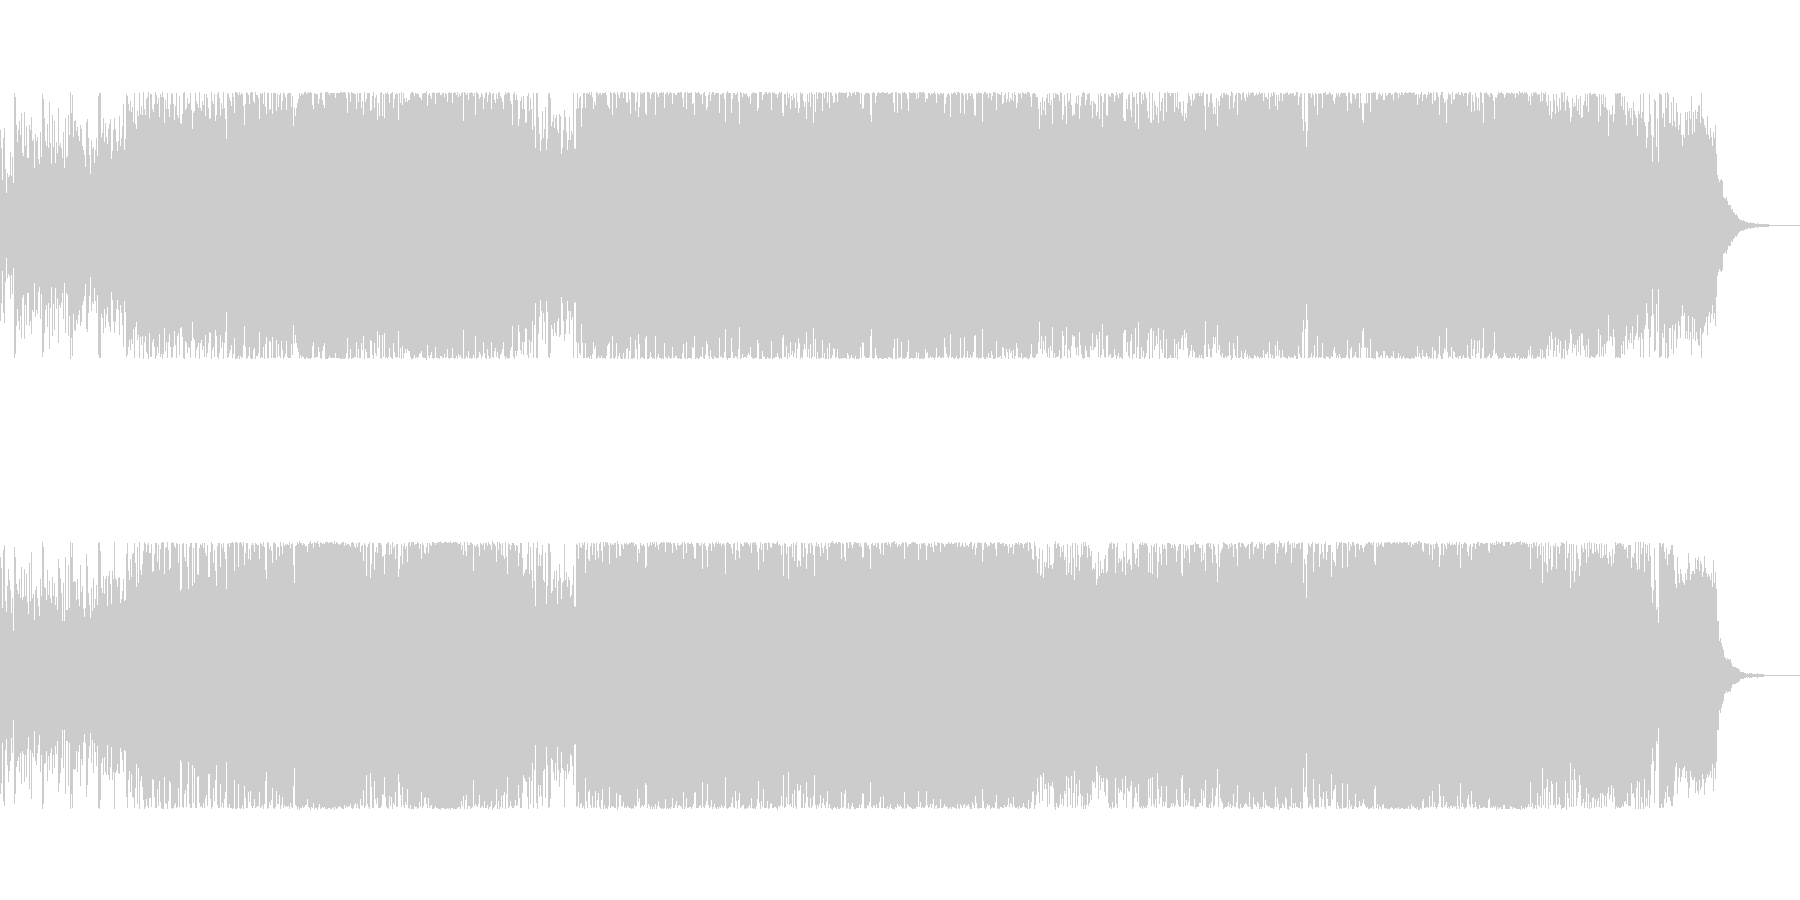 bpm136の力強く速いメロディのロックの未再生の波形